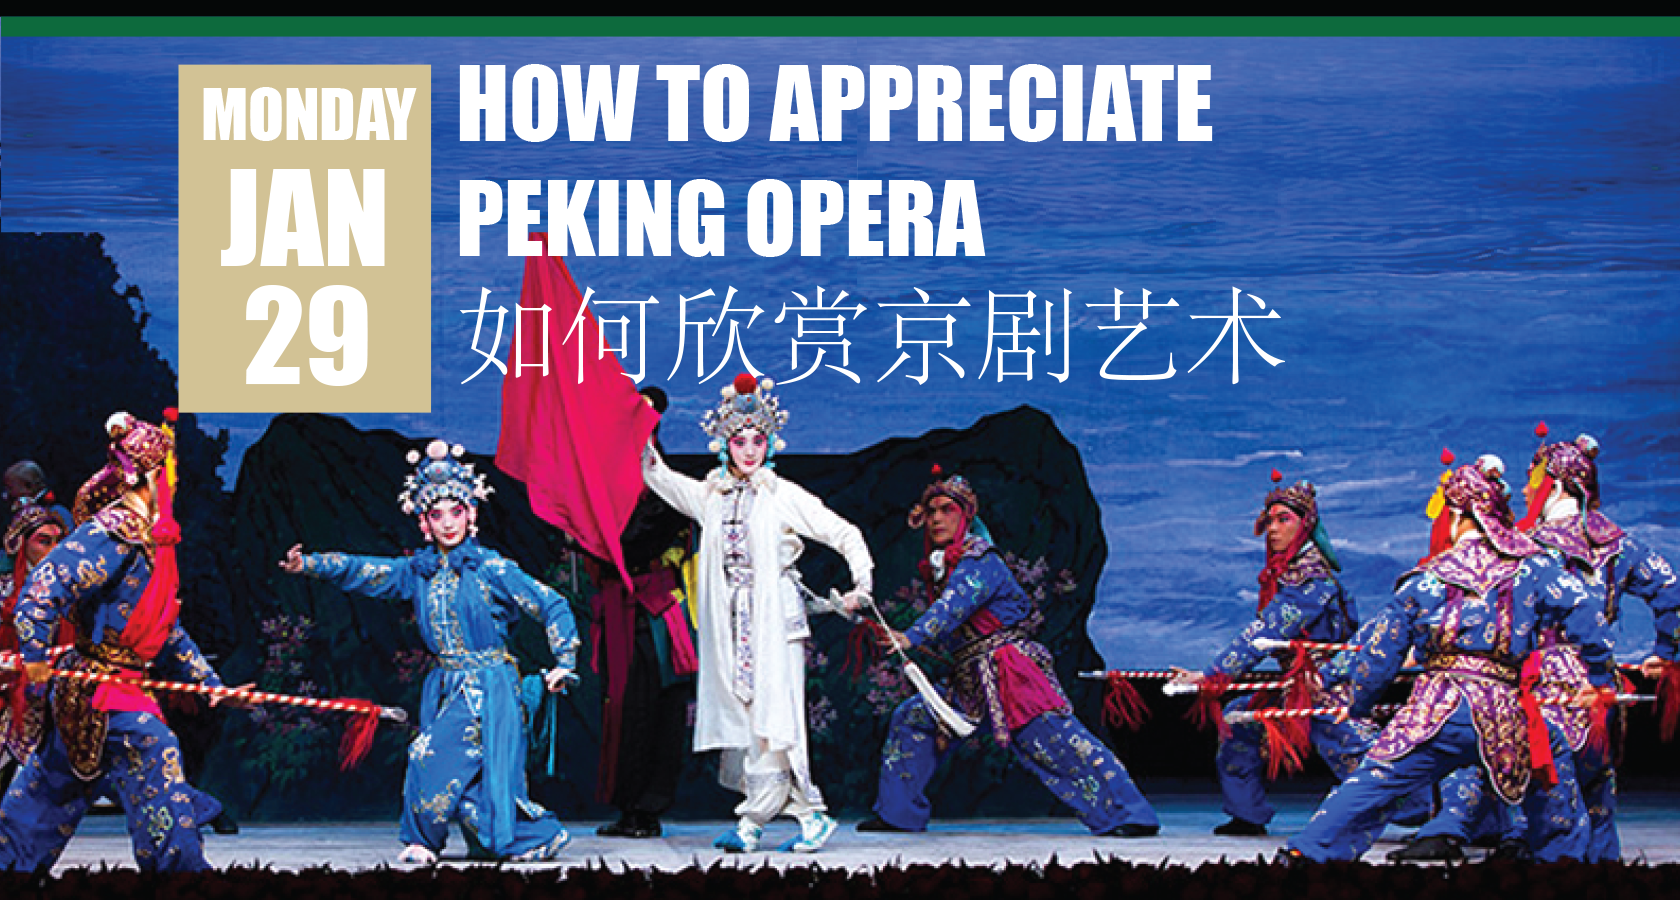 peaking opera